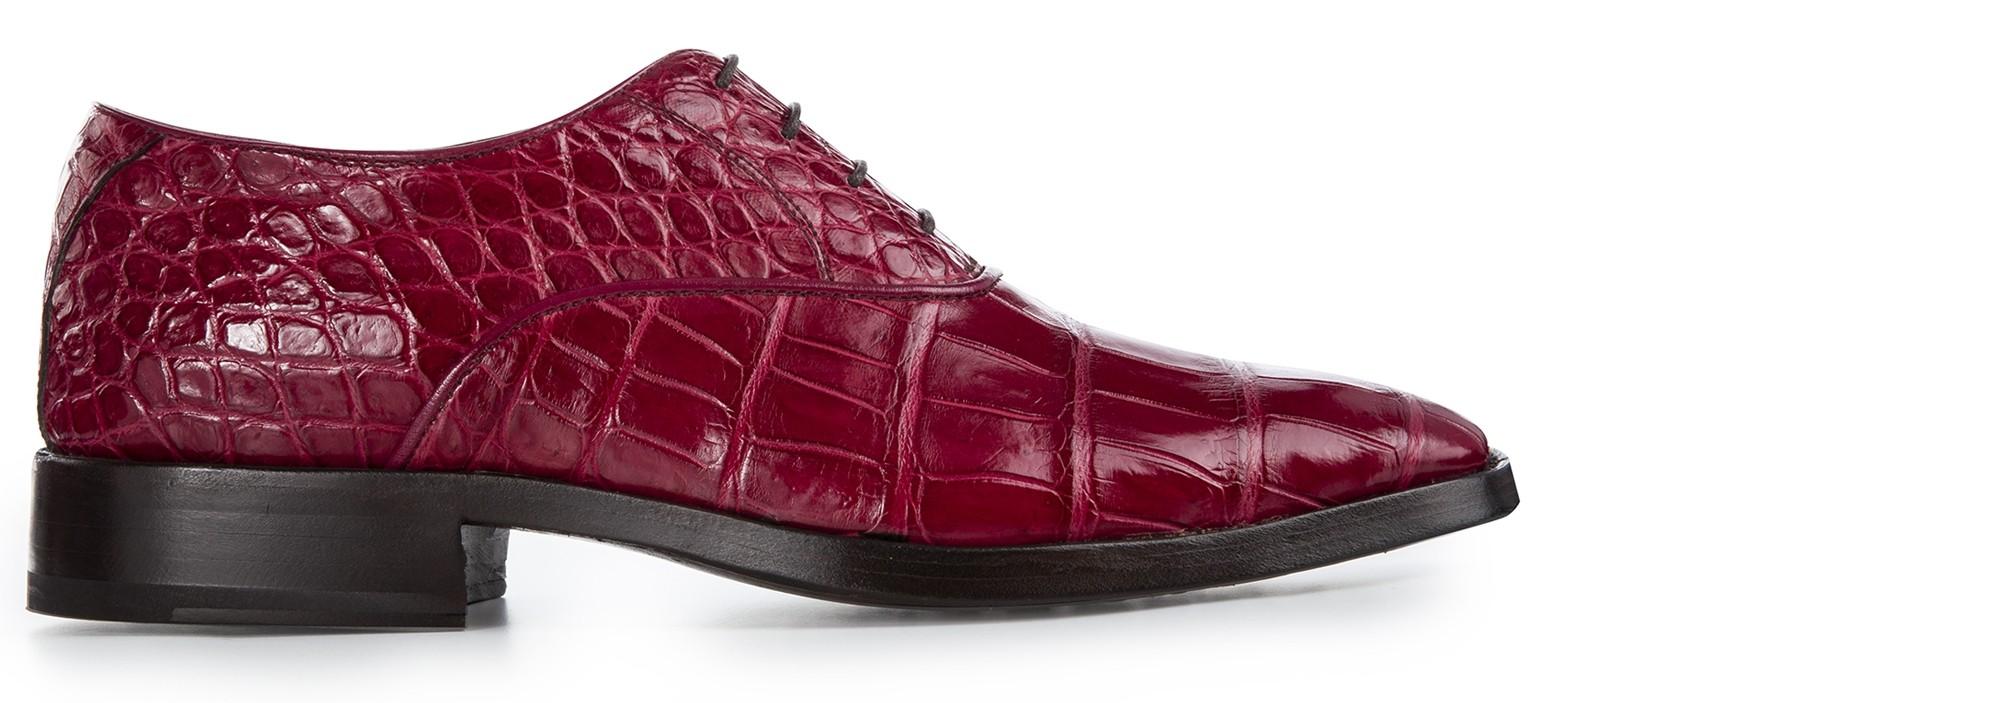 luxury elevator shoes